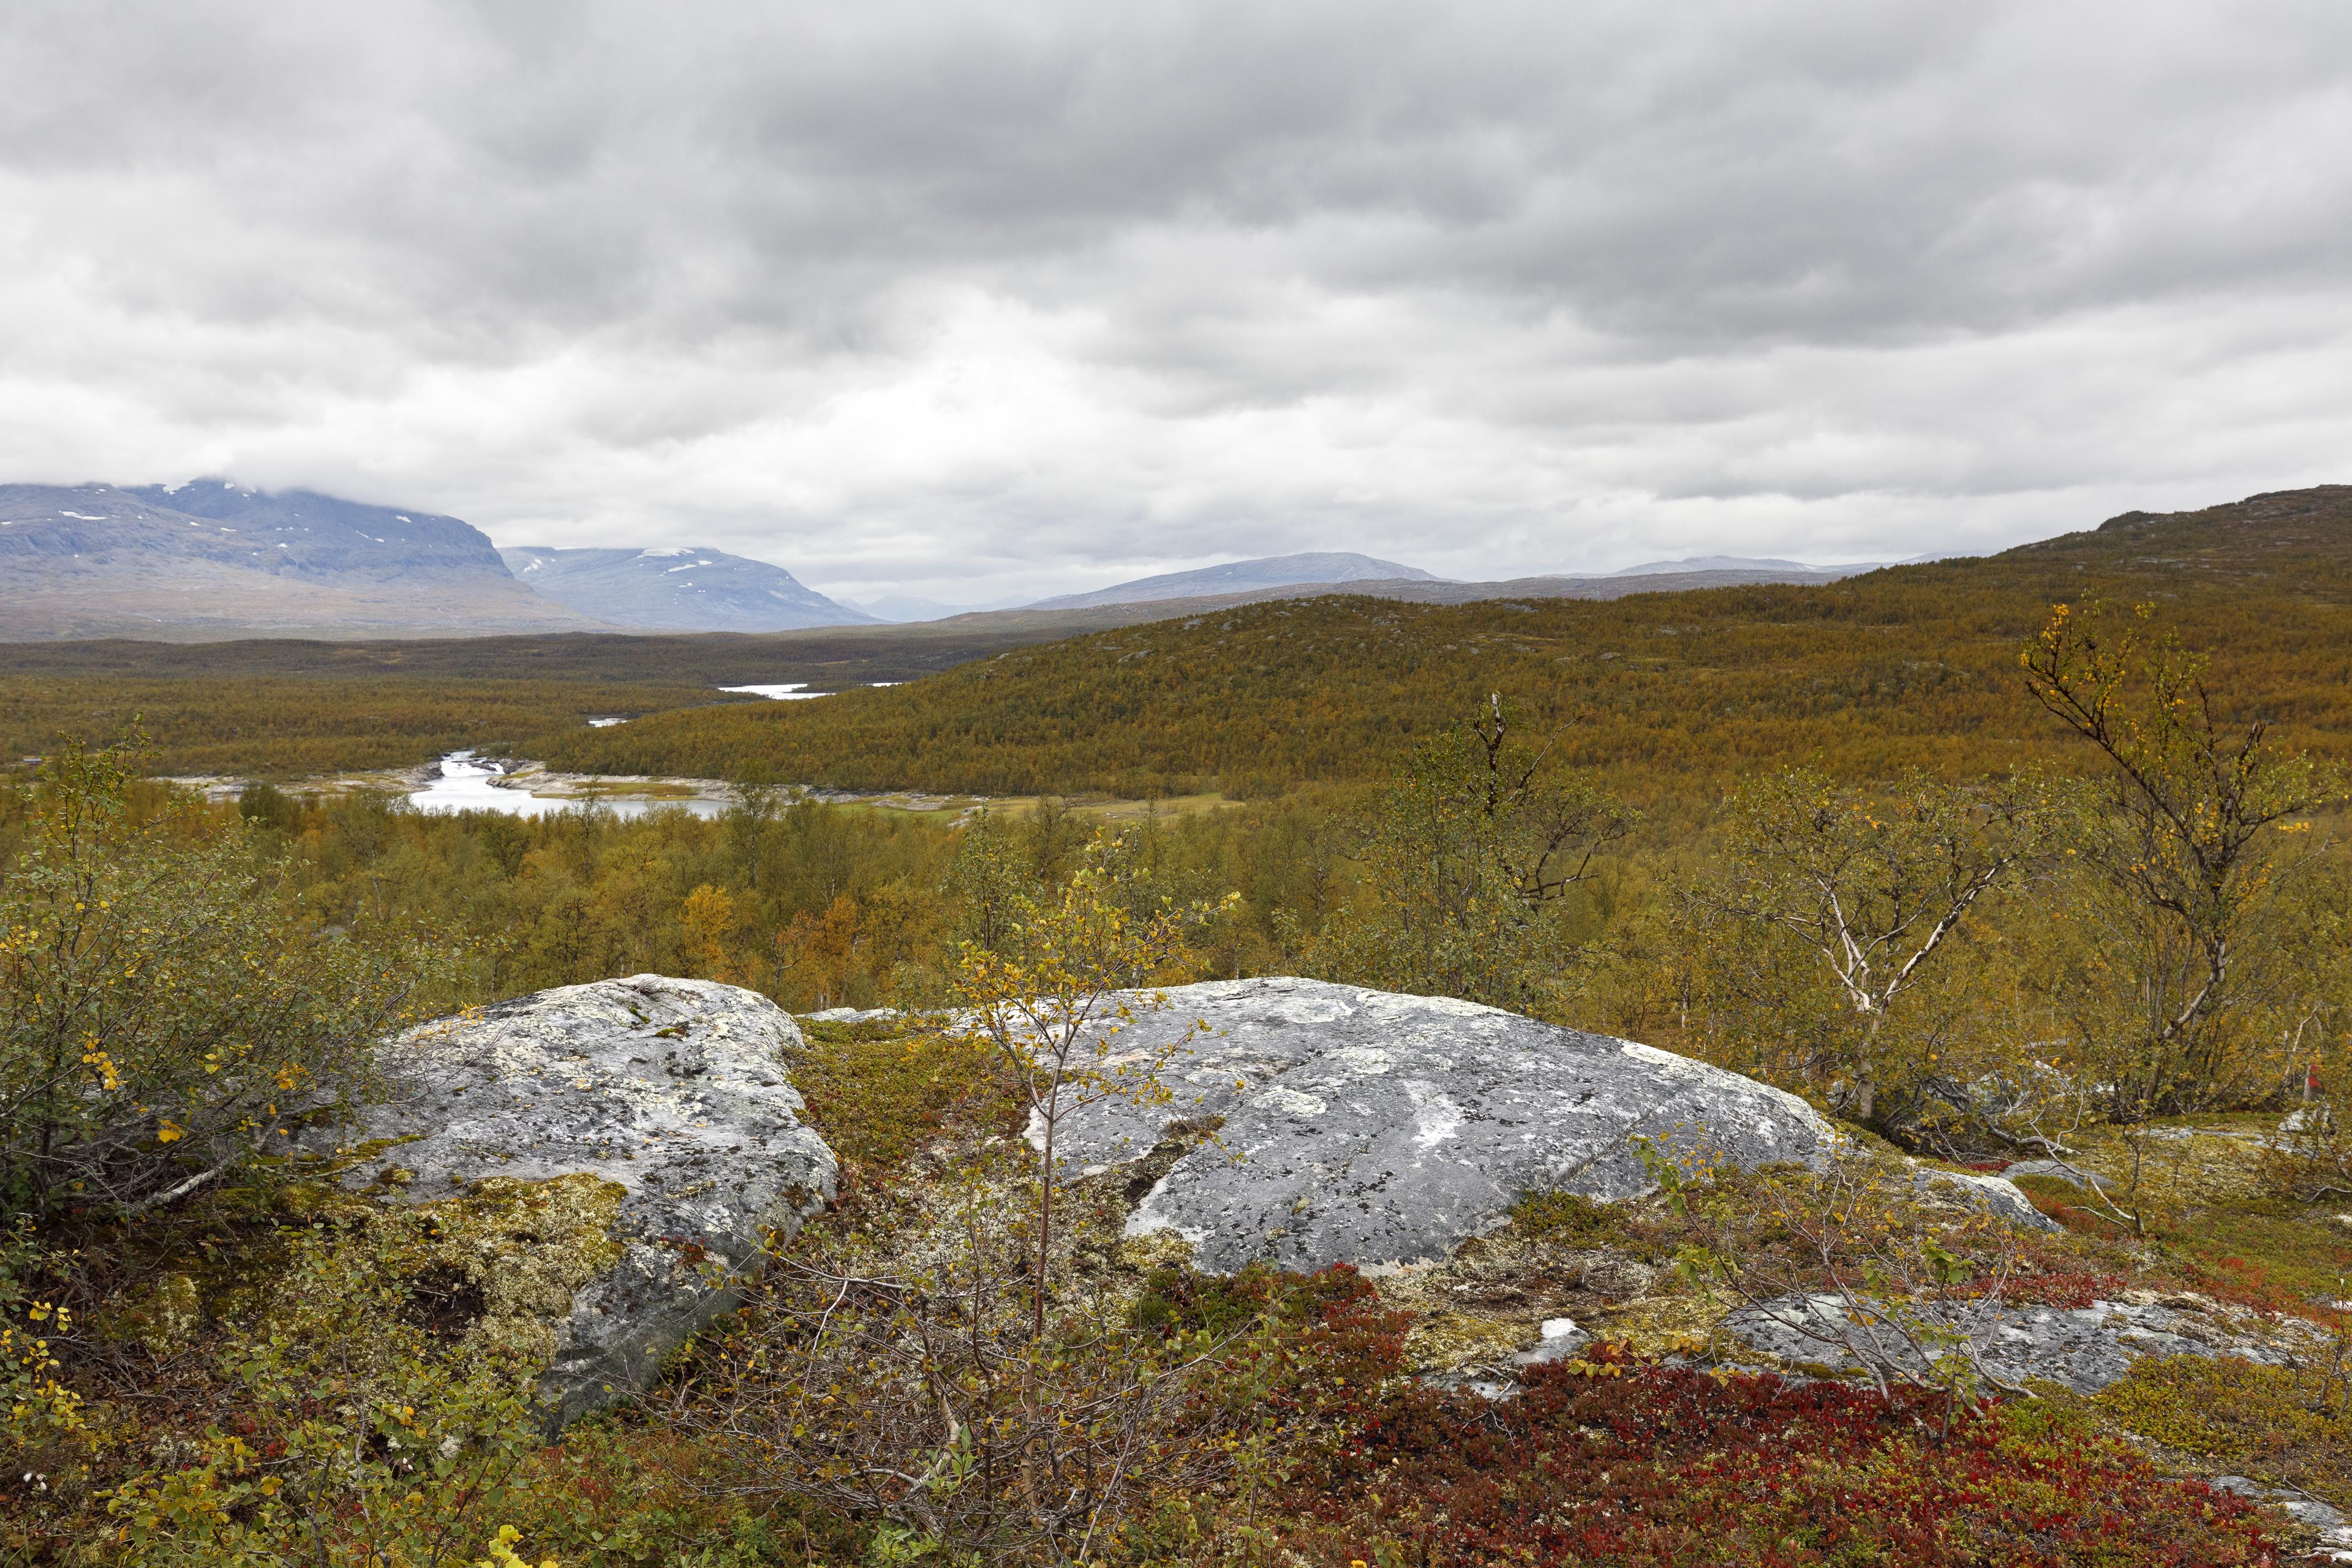 Ein erster Blick auf den Rastplatz Akkajaure Västenden (bei der Mündung des Sårgåjåhkå,©Markus Proske—Canon EOS 5D Mark IV, EF16-35mm f/4L IS USM, 35mm, 1/80s, Blende 8, ISO 500